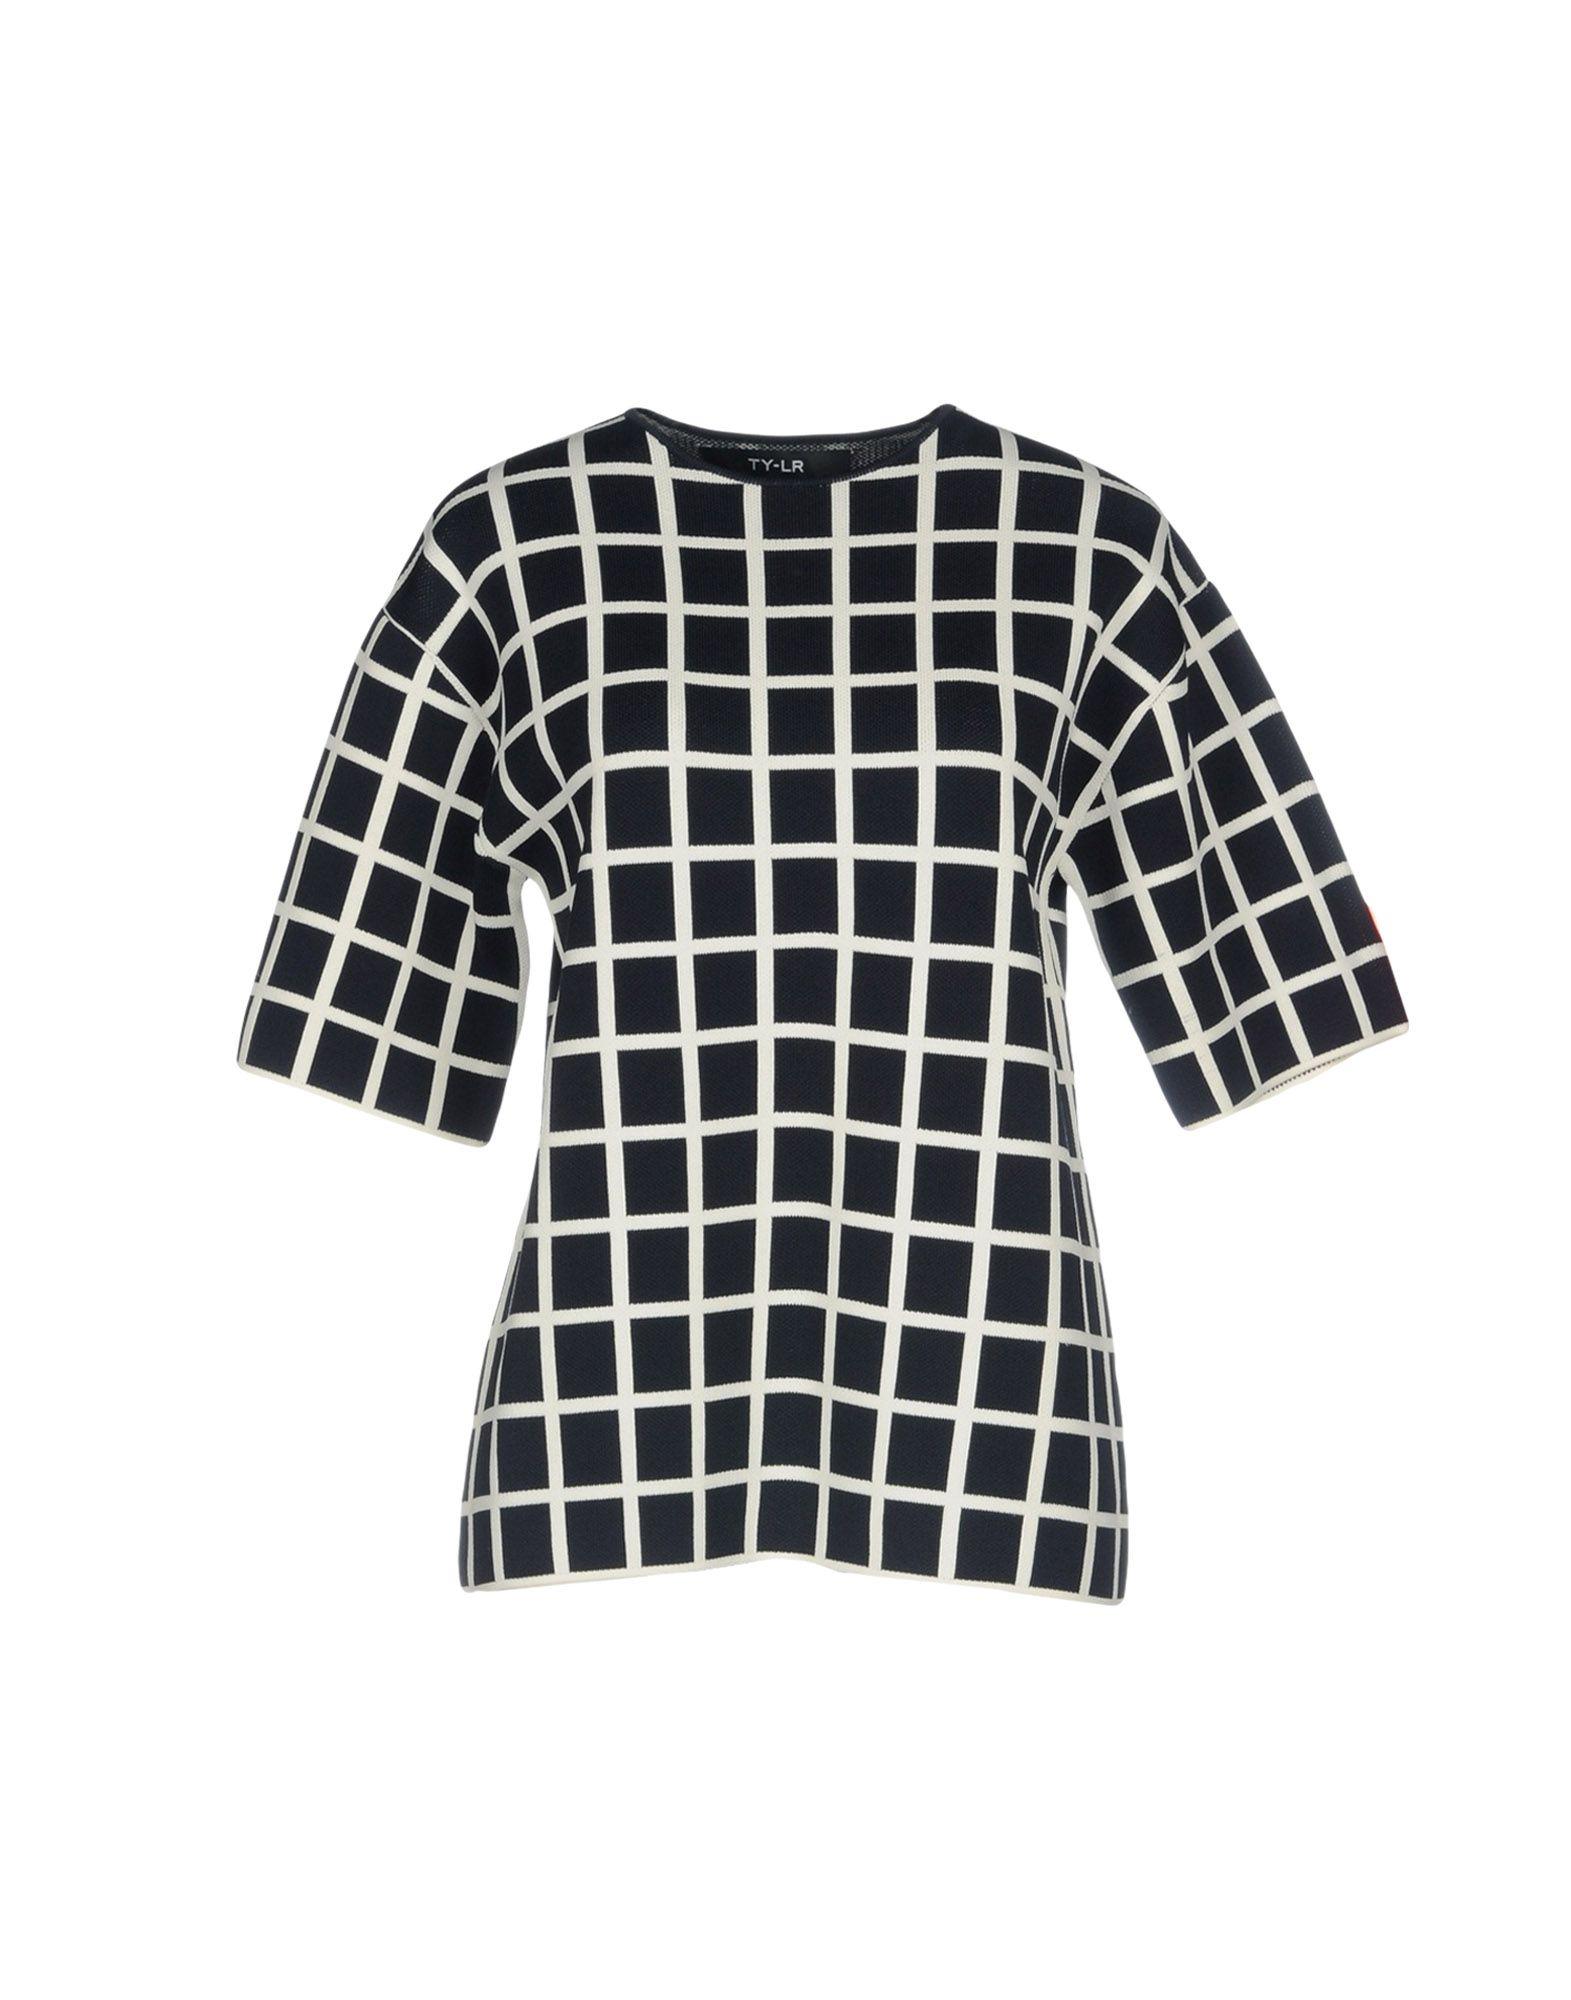 TY-LR Sweater in Dark Blue